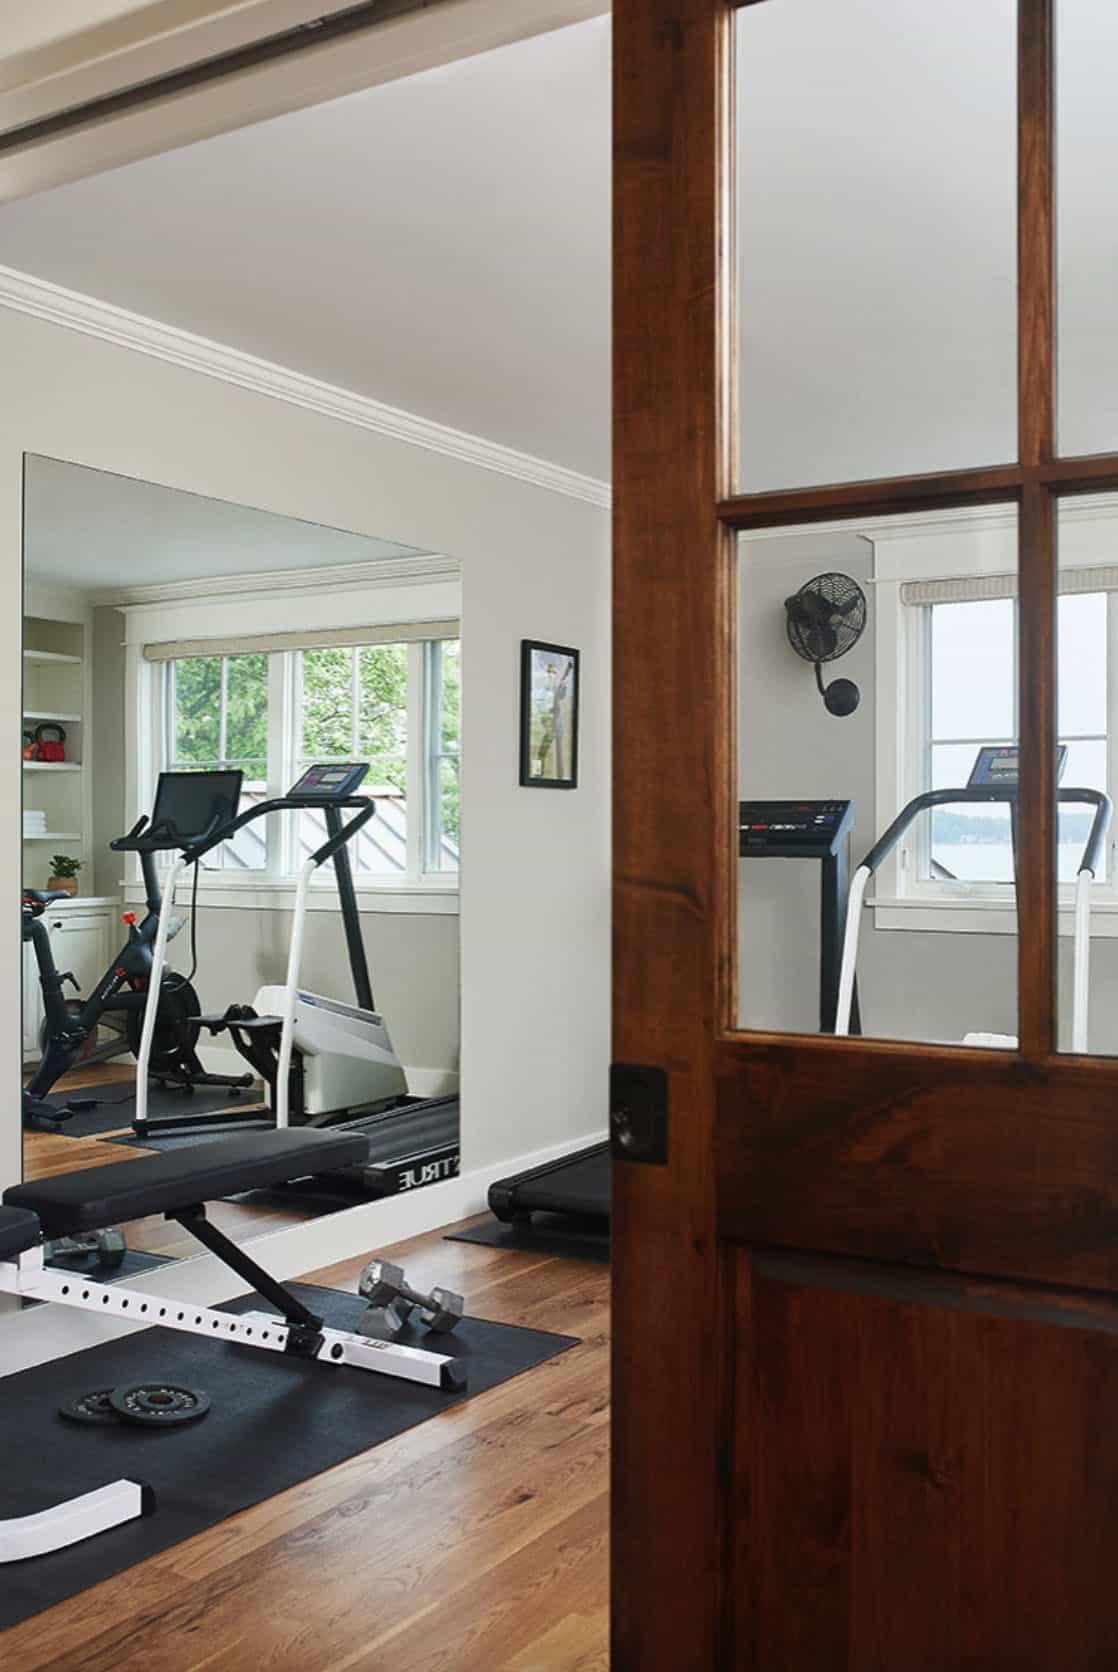 rustic-modern-home-gym